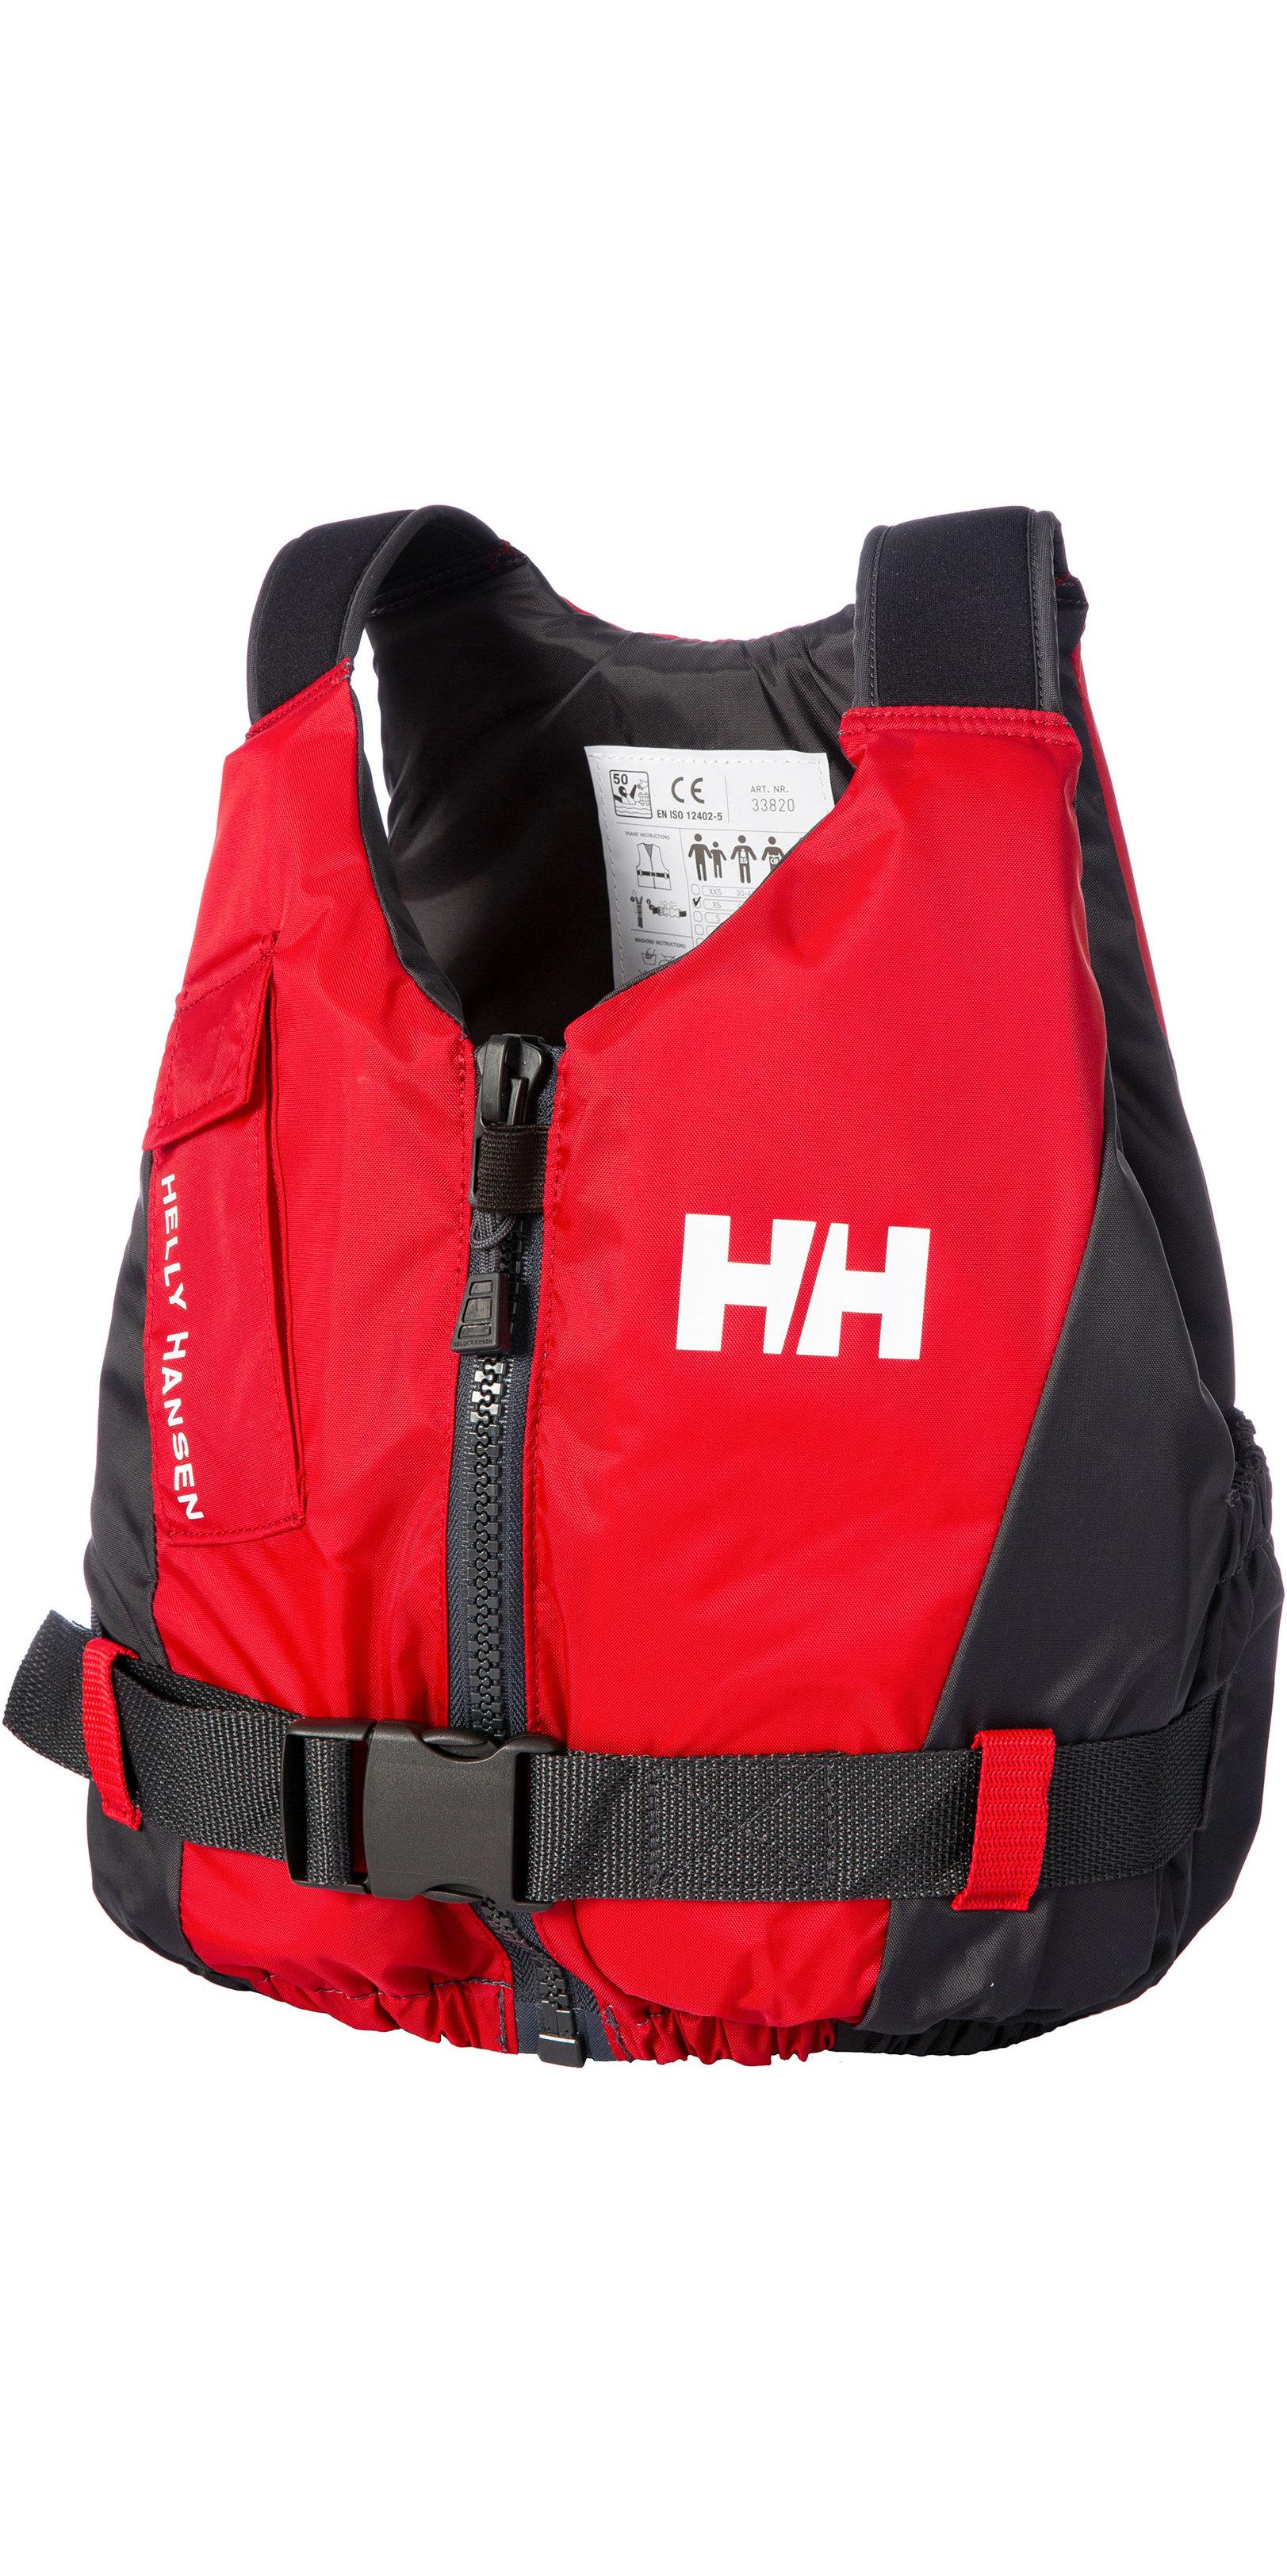 2019 Helly Hansen 50N Rider Vest / Buoyancy Aid 33820 - Red